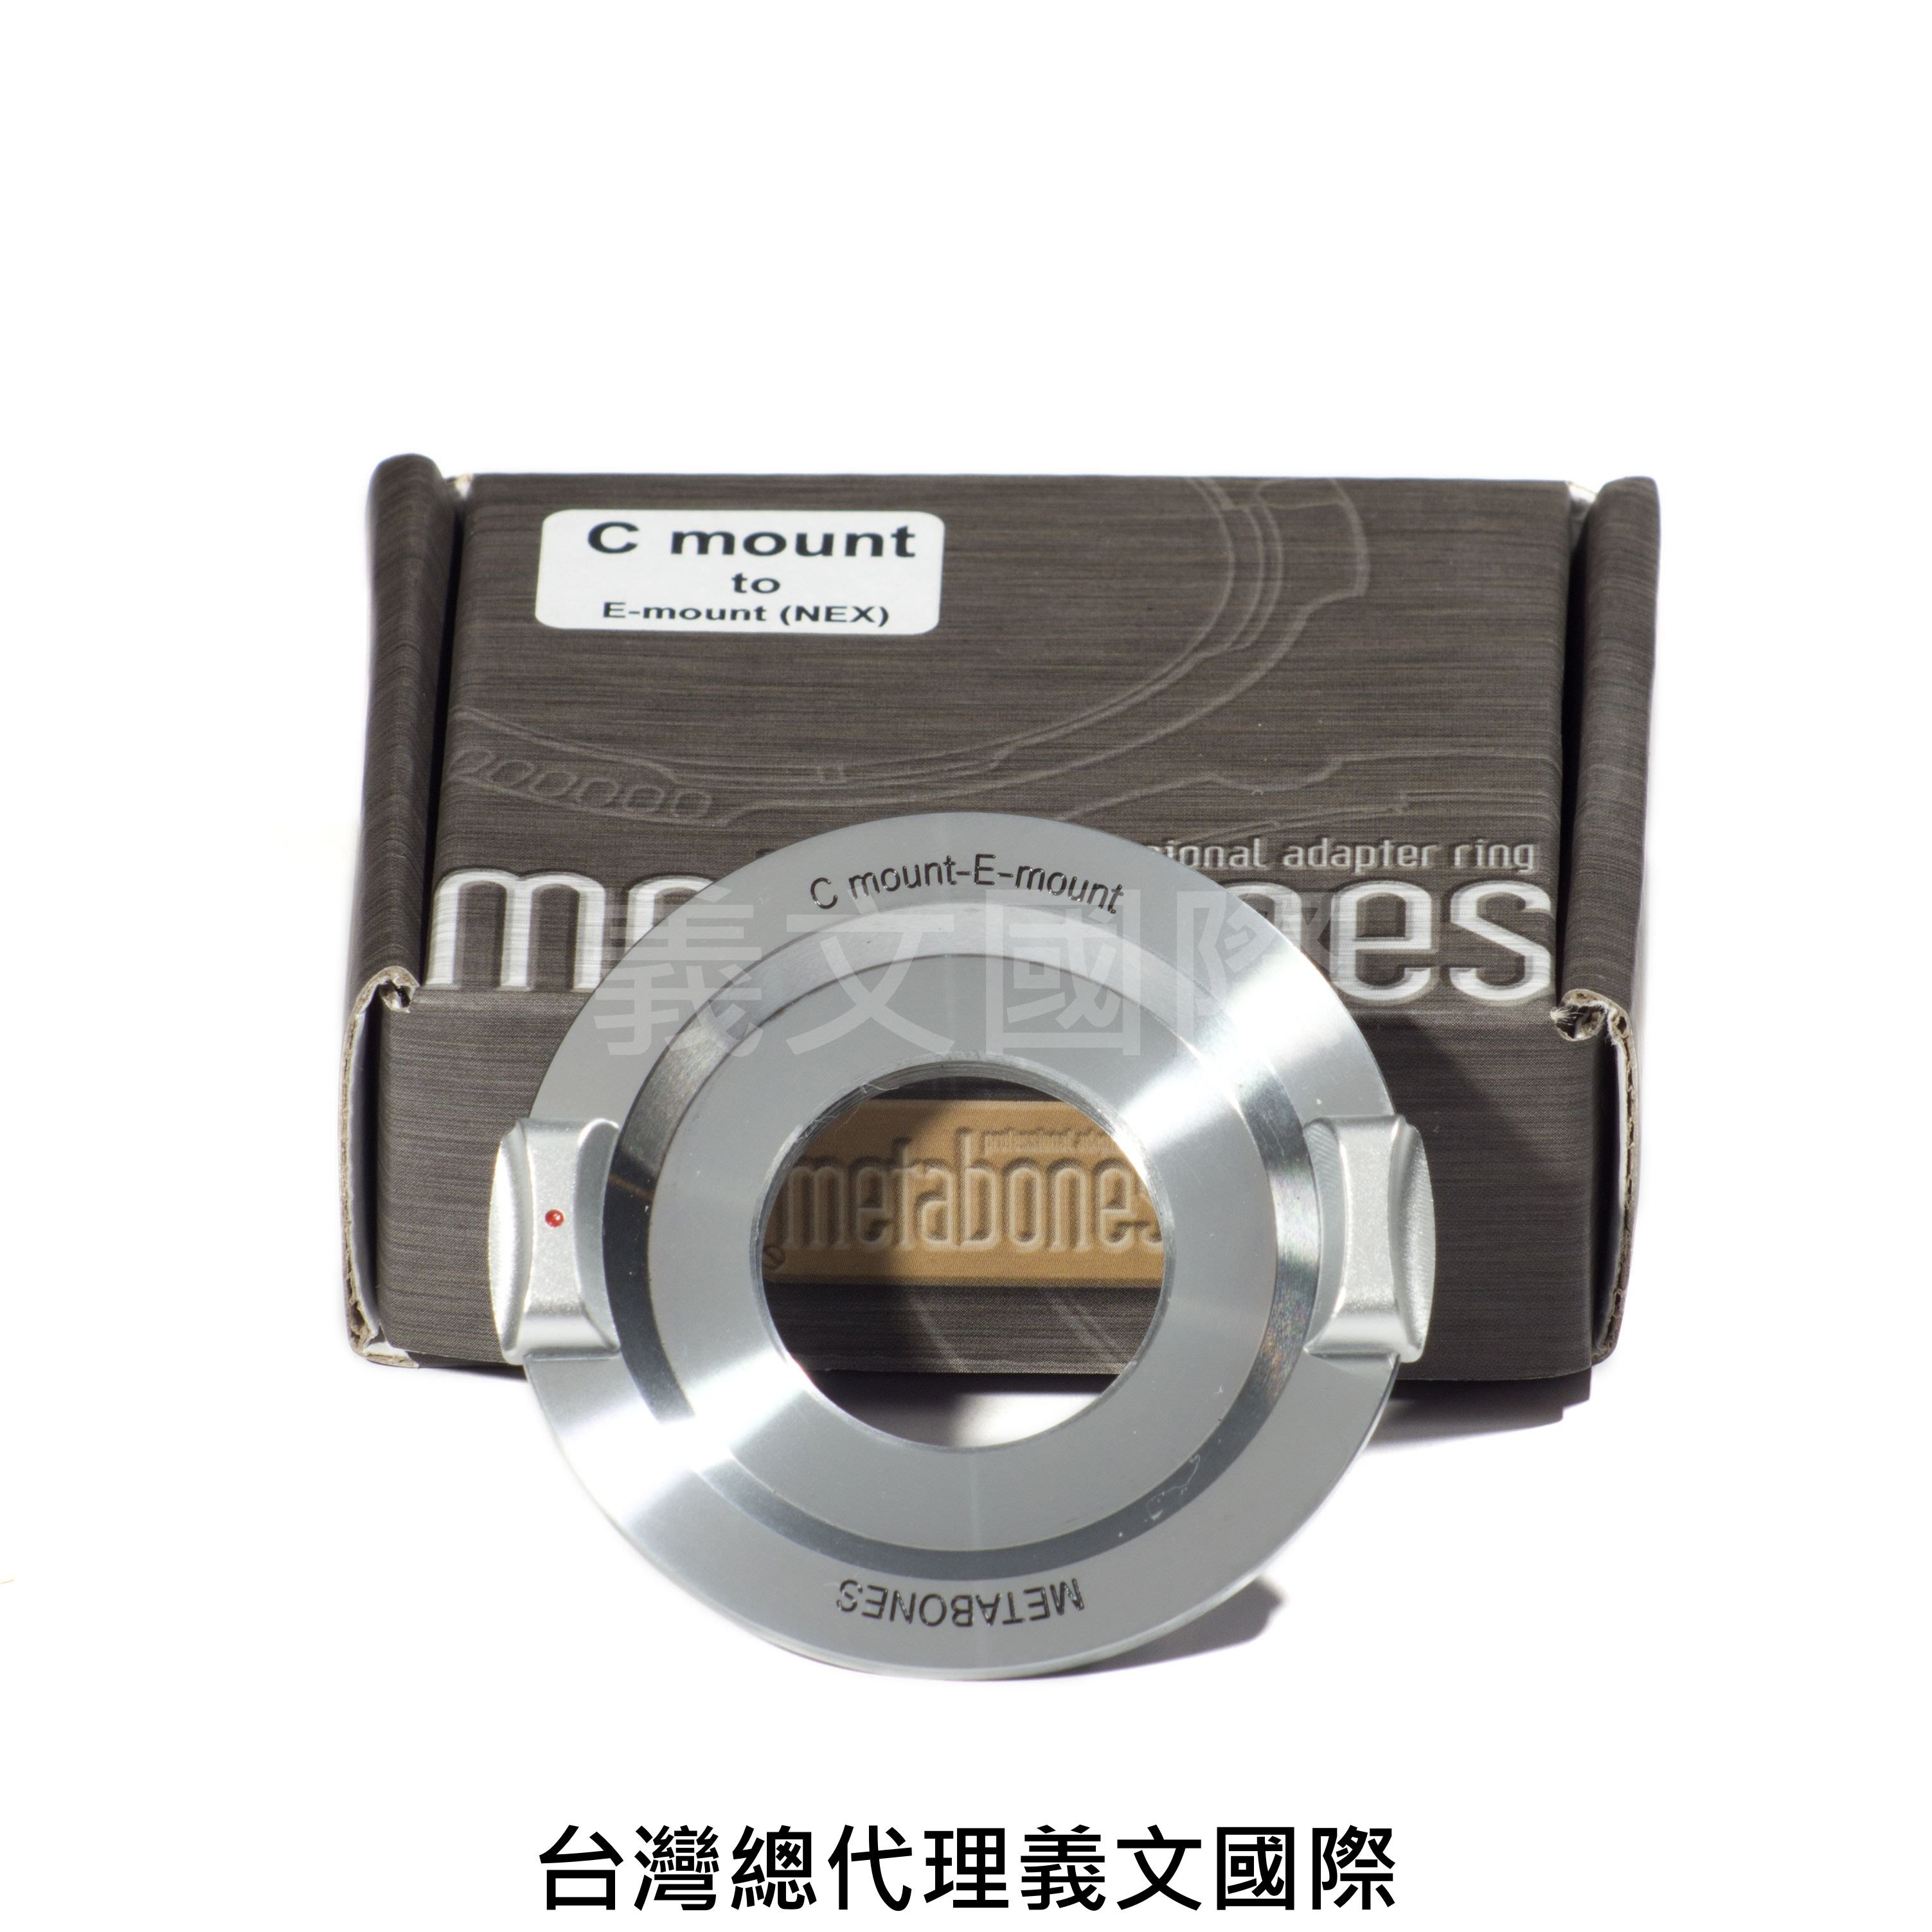 Metabones專賣店:Cmount-Emount (Sony E_Nex_索尼_監視器C卡口_A7R4_A7R3_A72_轉接環)